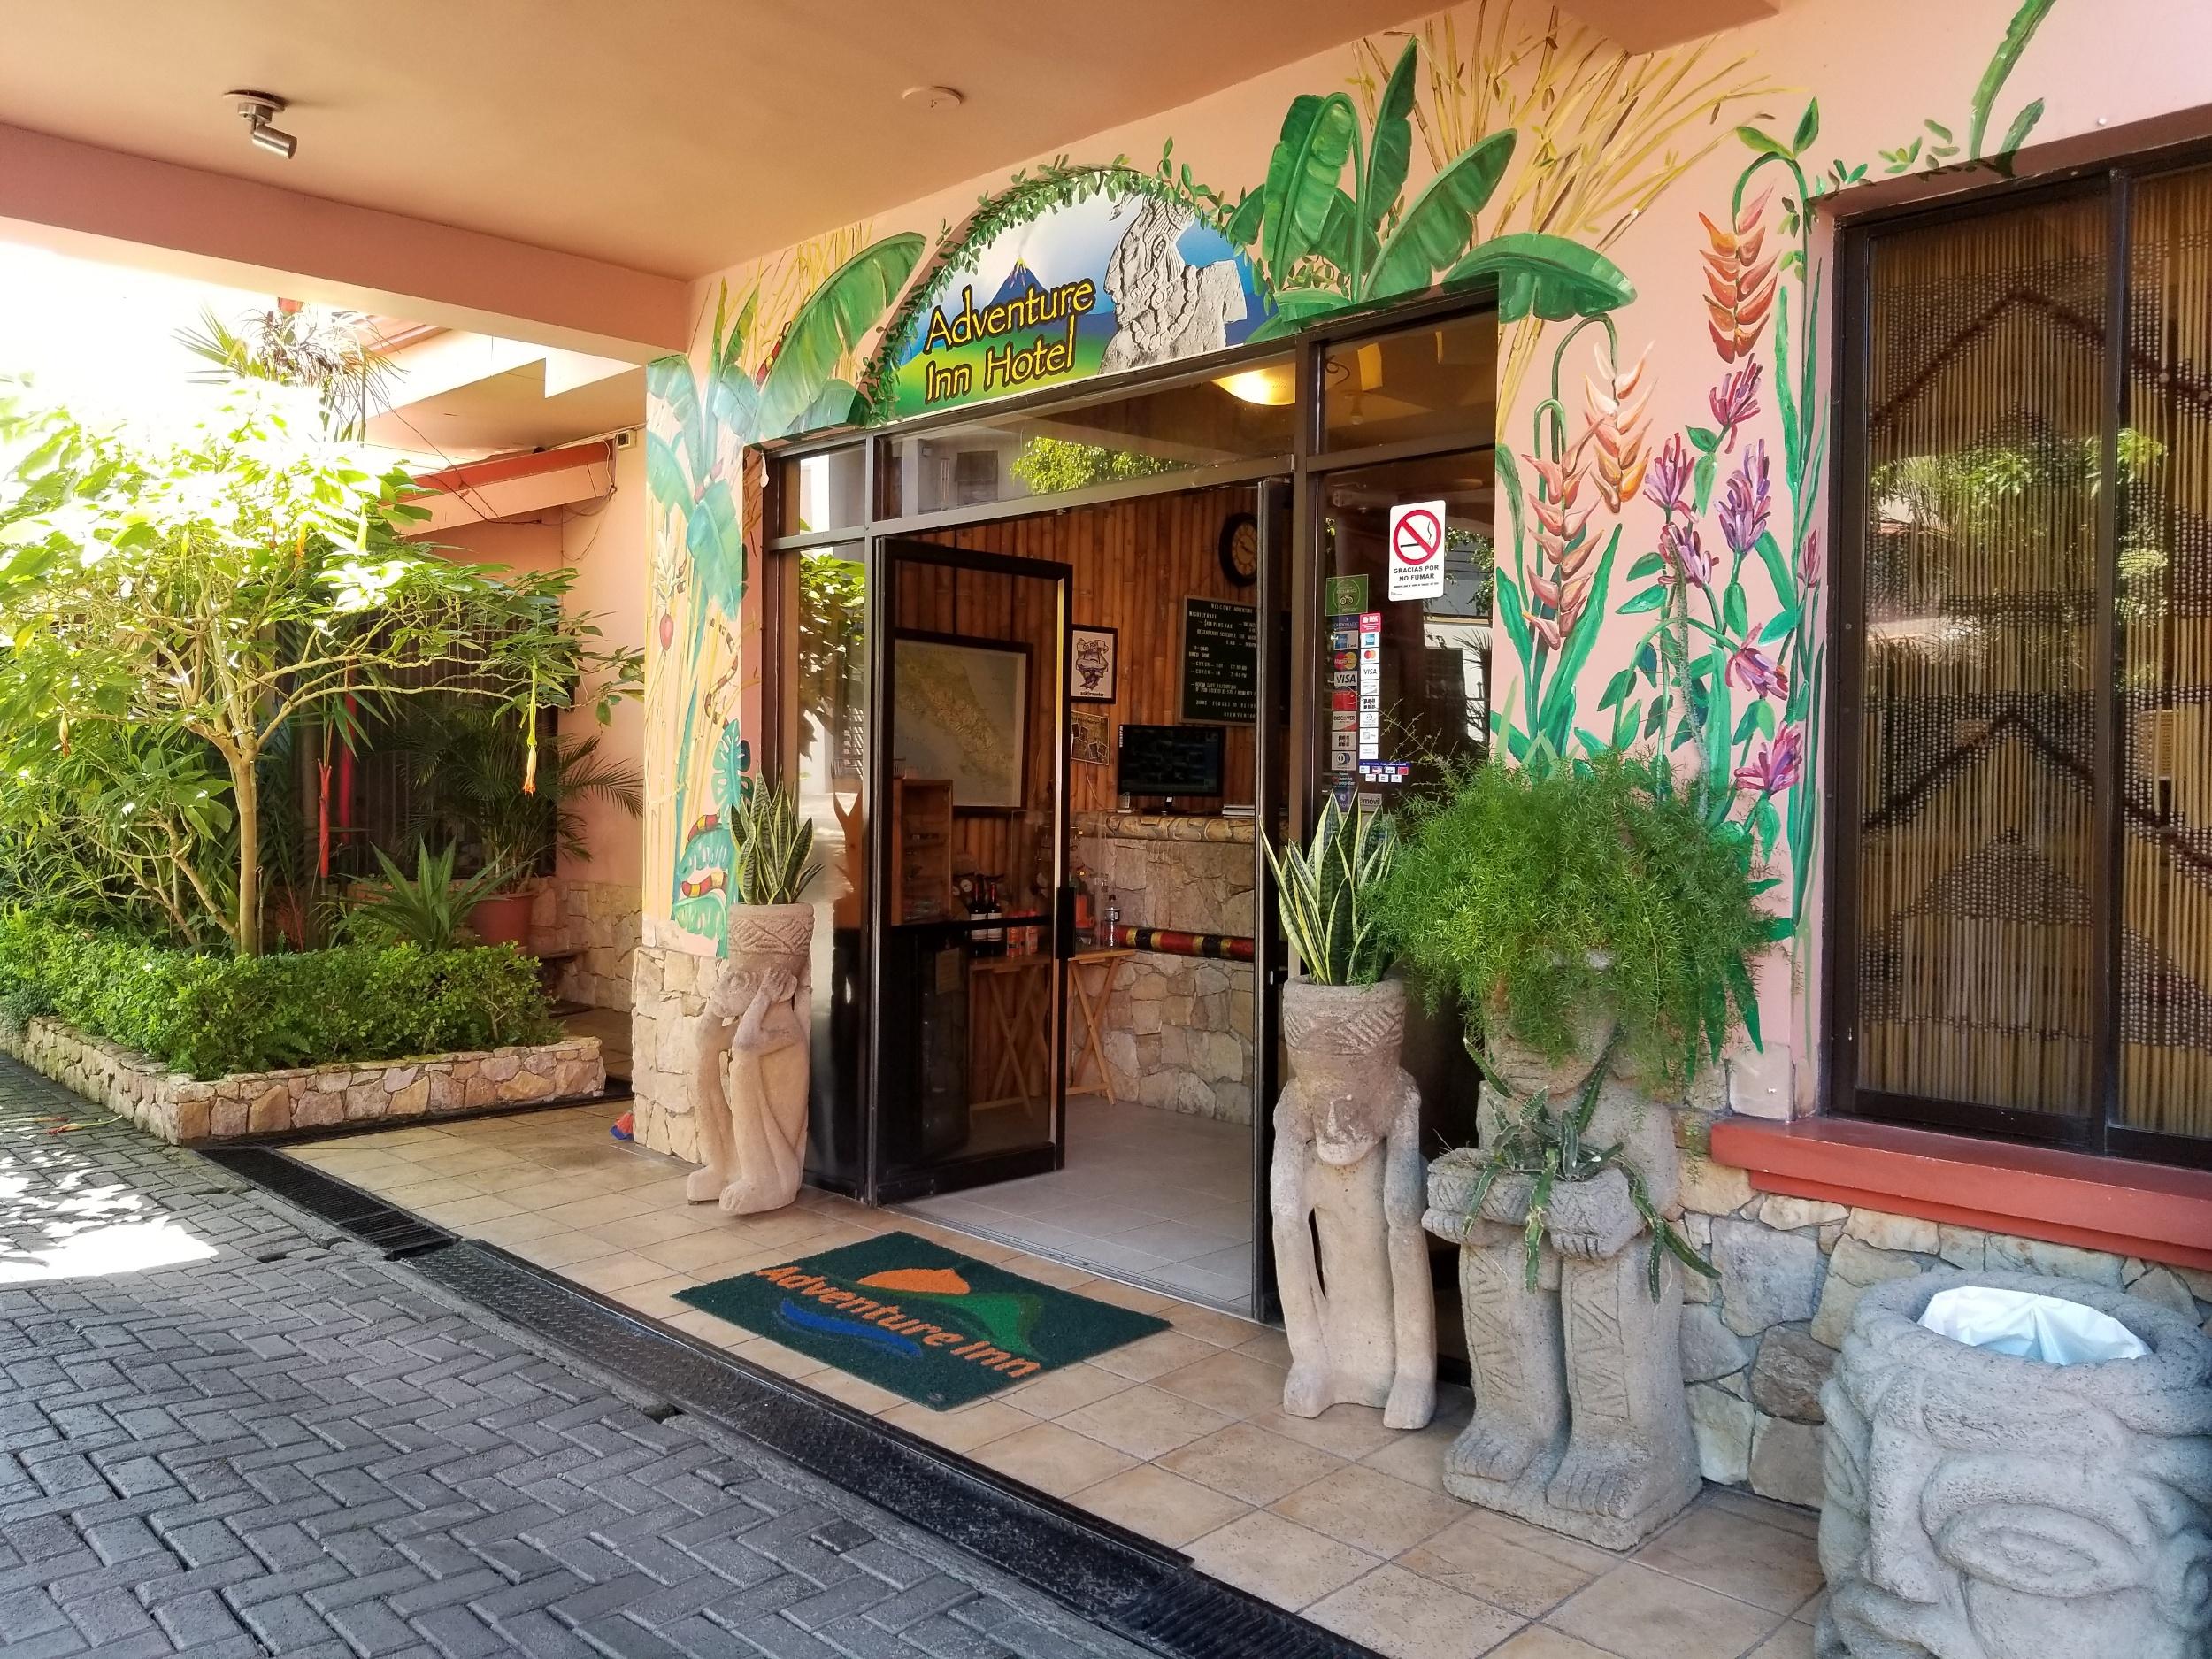 The captivating entrance of Adventure Inn.